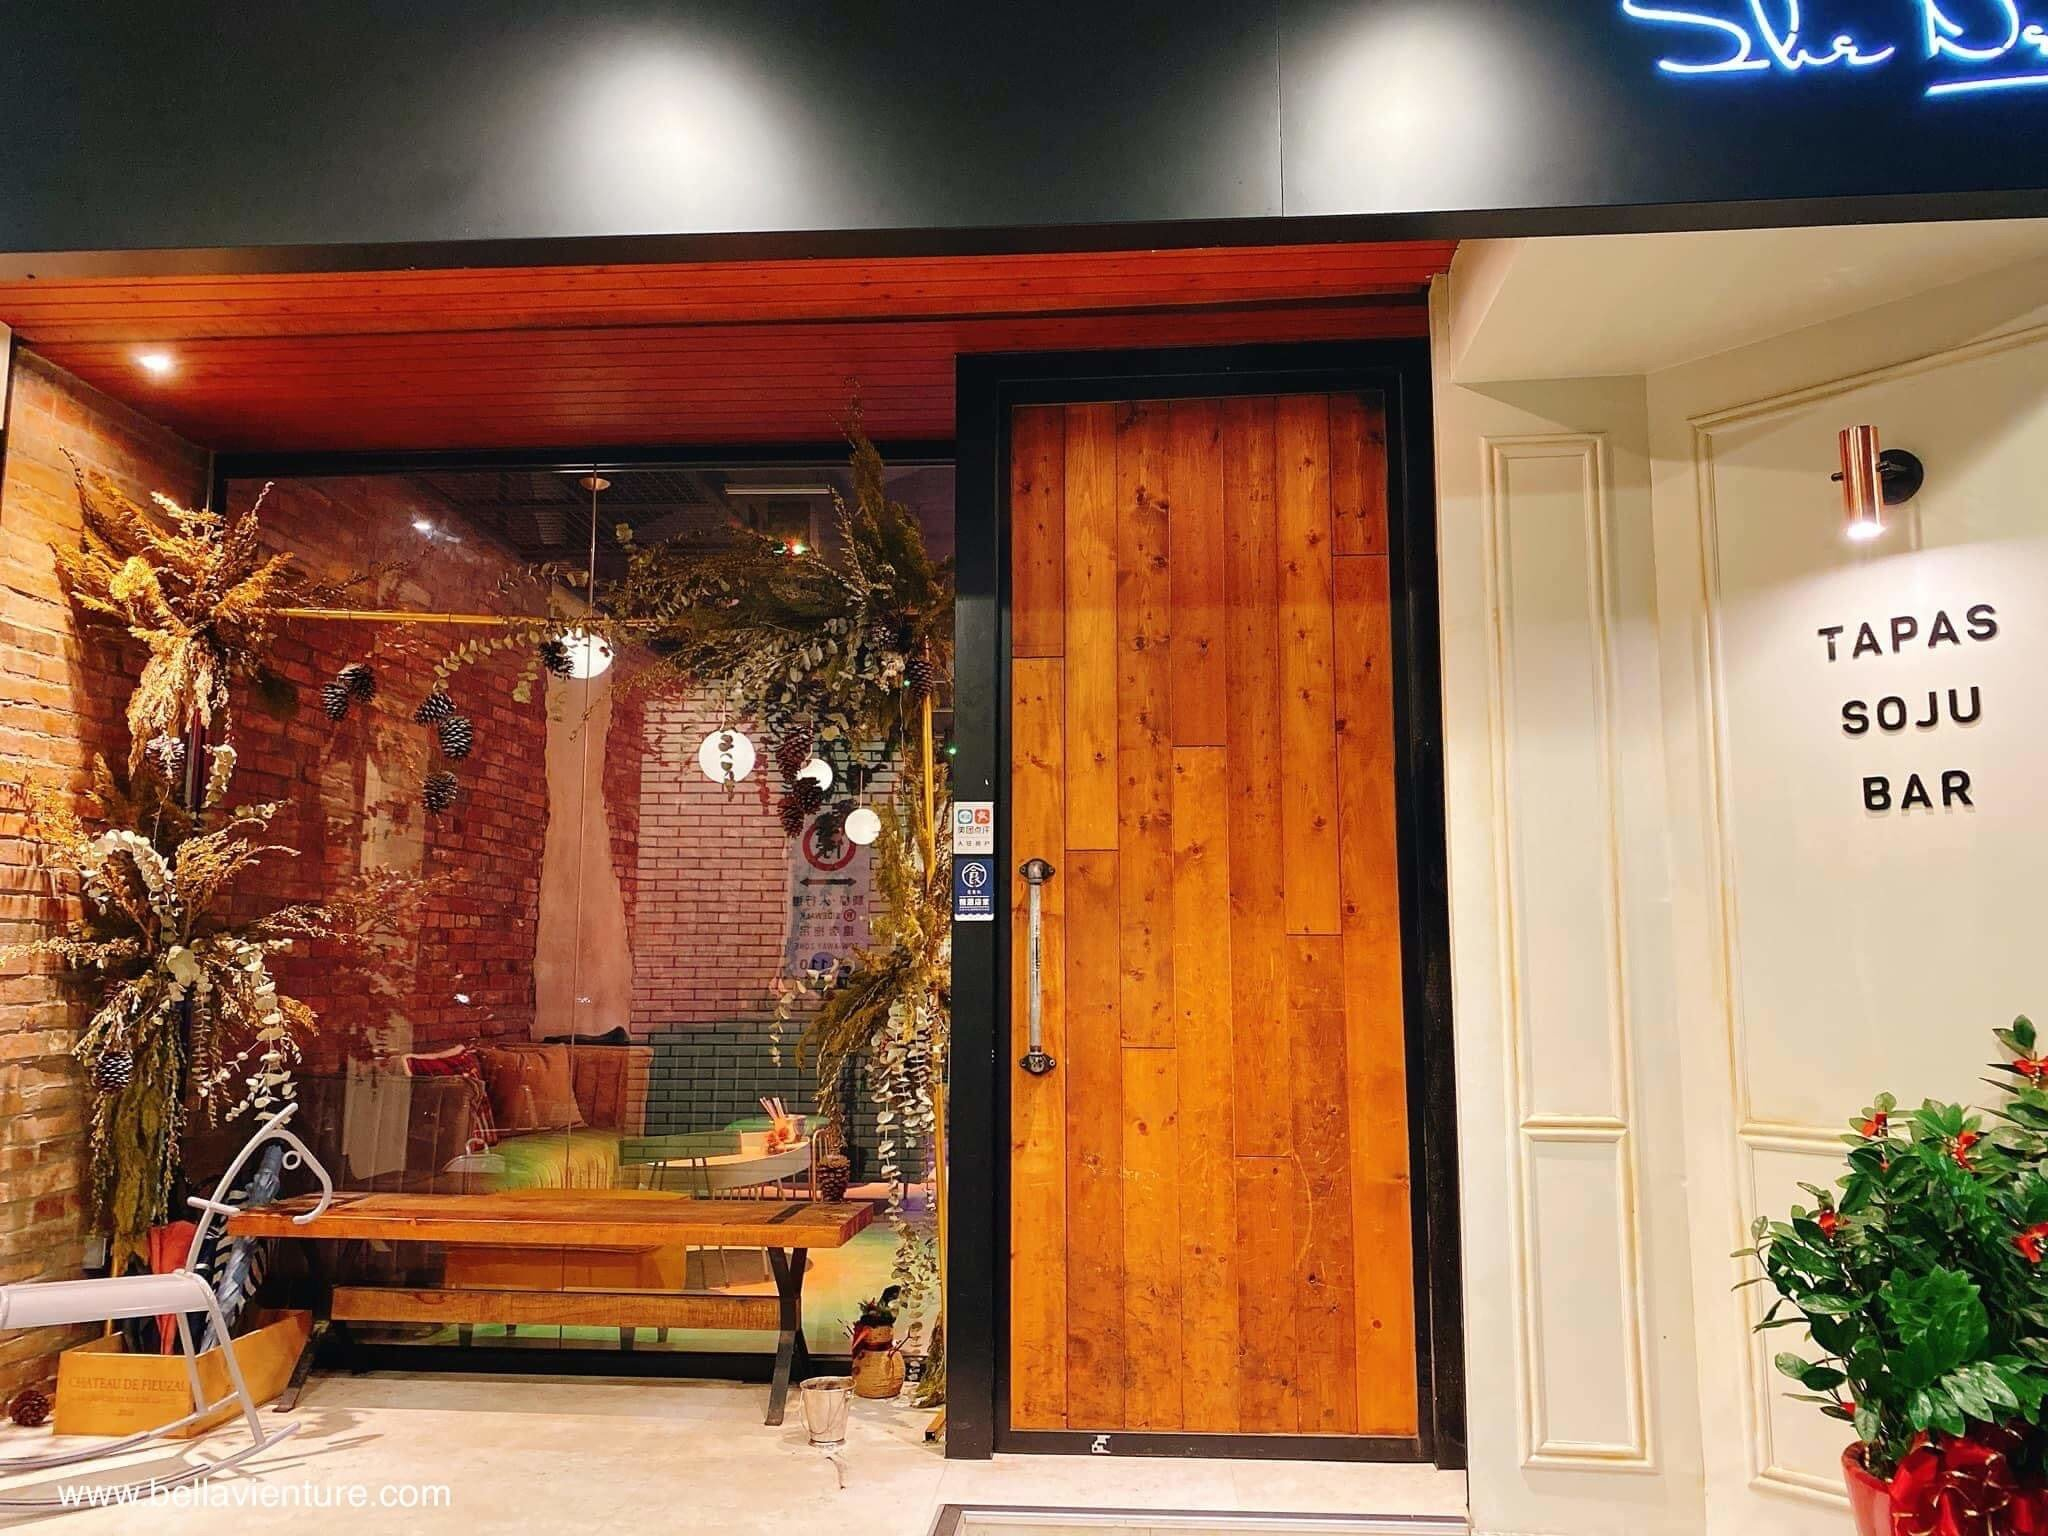 台北 信義區 She_Design TAPAS SOJU BAR 店門口